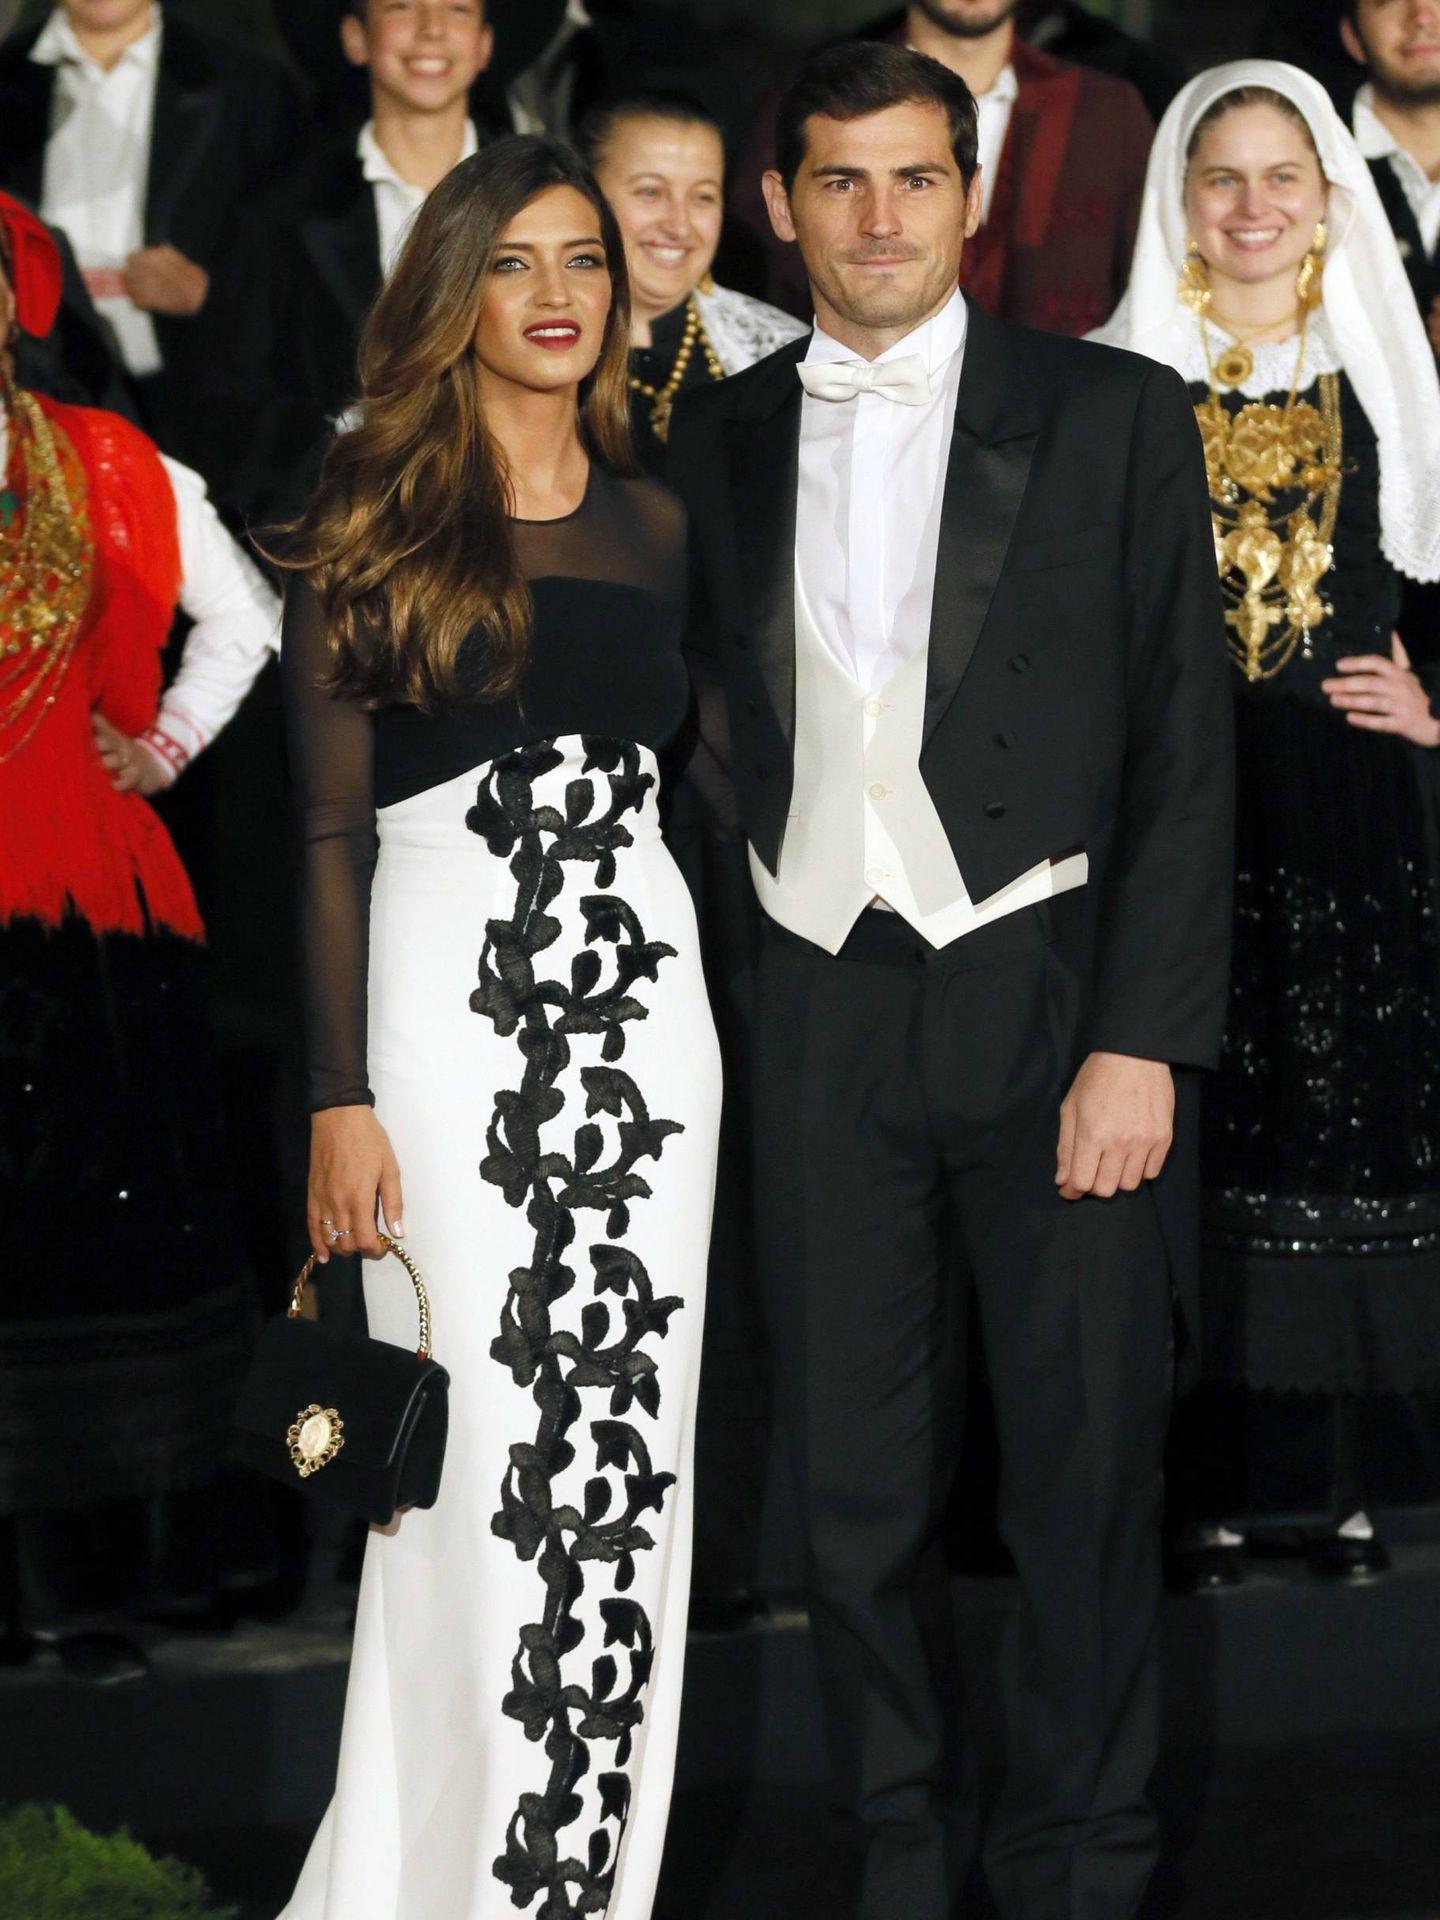 Sara Carbonero e Iker Casillas, en Portugal. (Cordon Press)